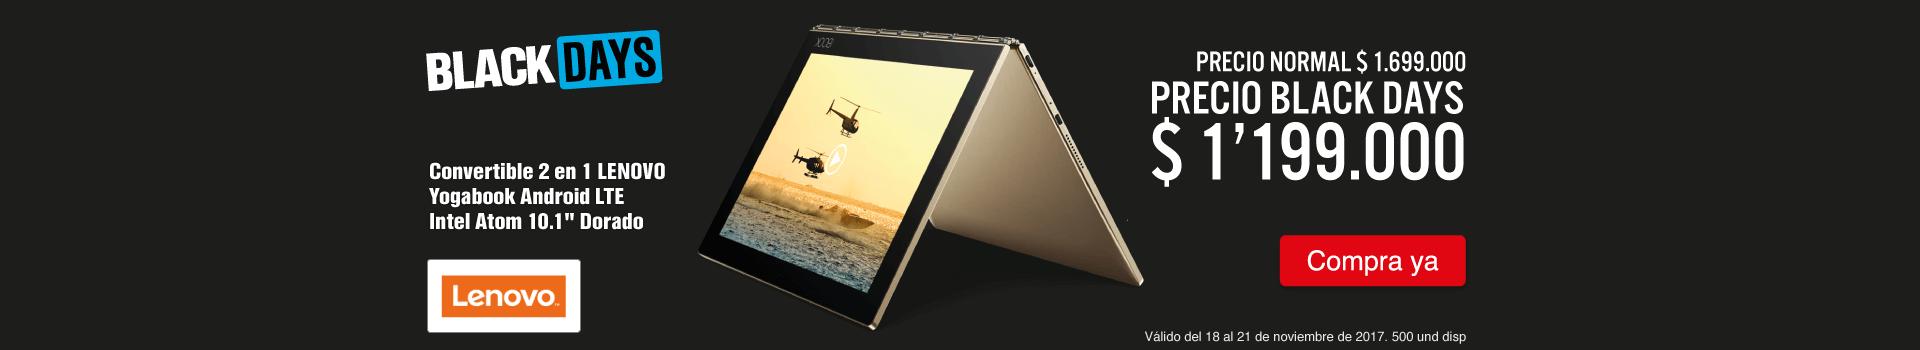 HIPER KT-1-computadores-Convertible 2 en 1 LENOVO - Yogabook Android LTE Intel Atom 10.1